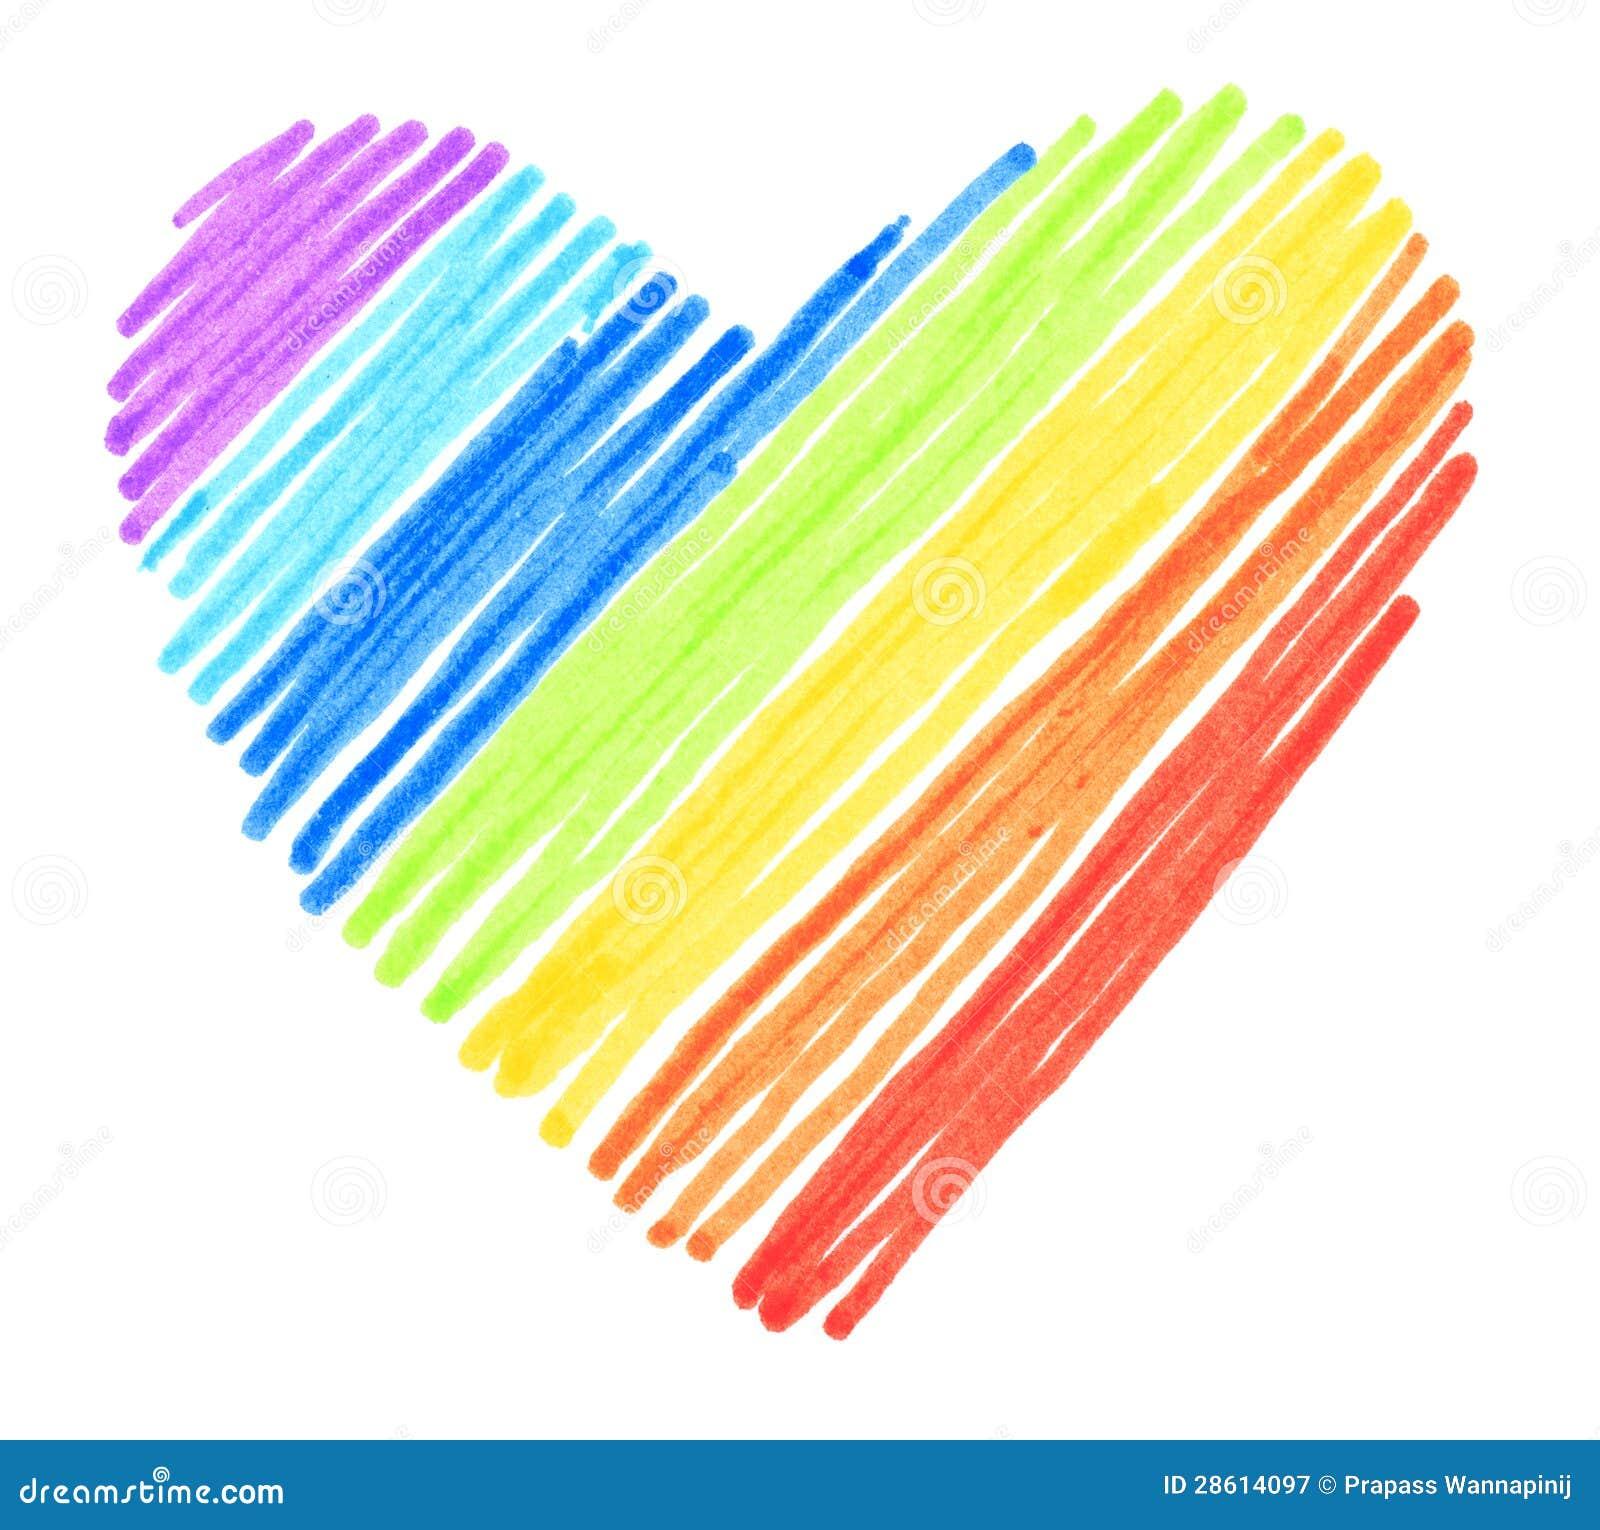 rainbow color drawing stroke heart shape royalty free stock